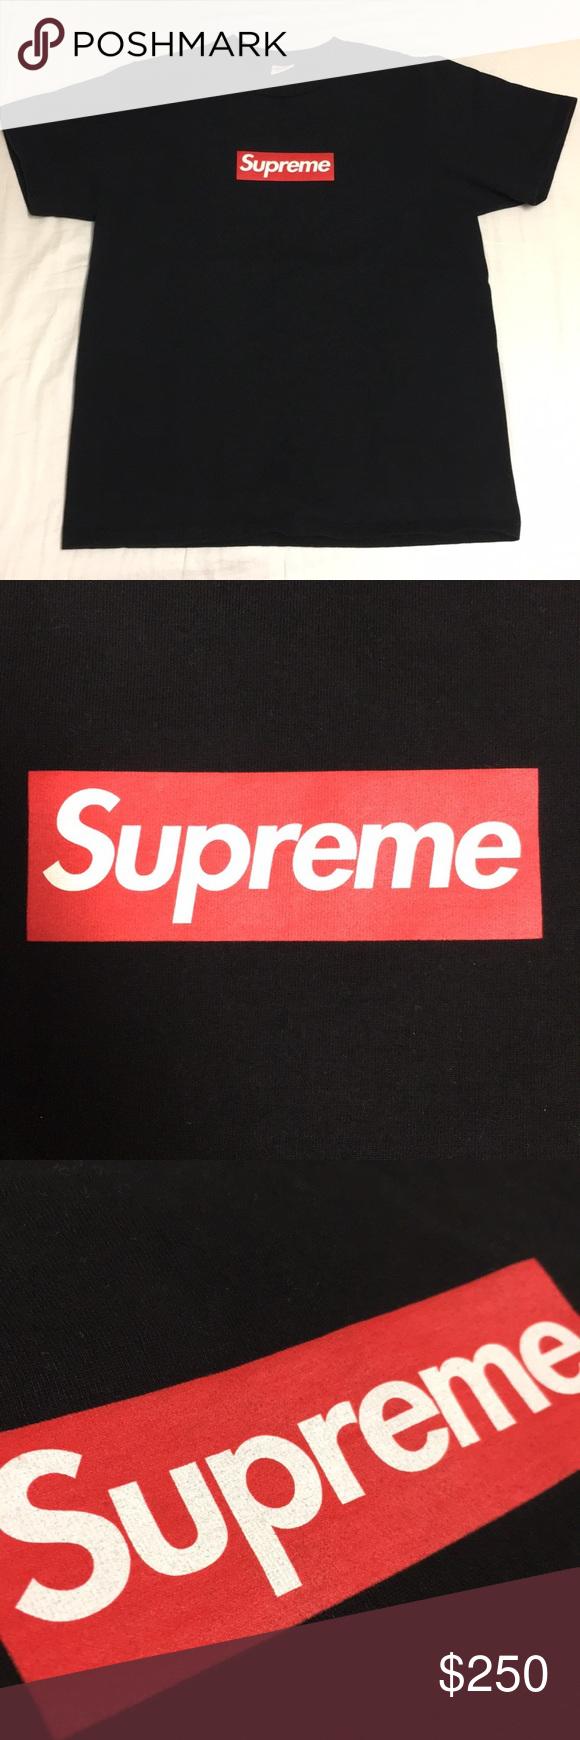 (Worn) Supreme 20th Anniversary BoxLogo Tee Clothes